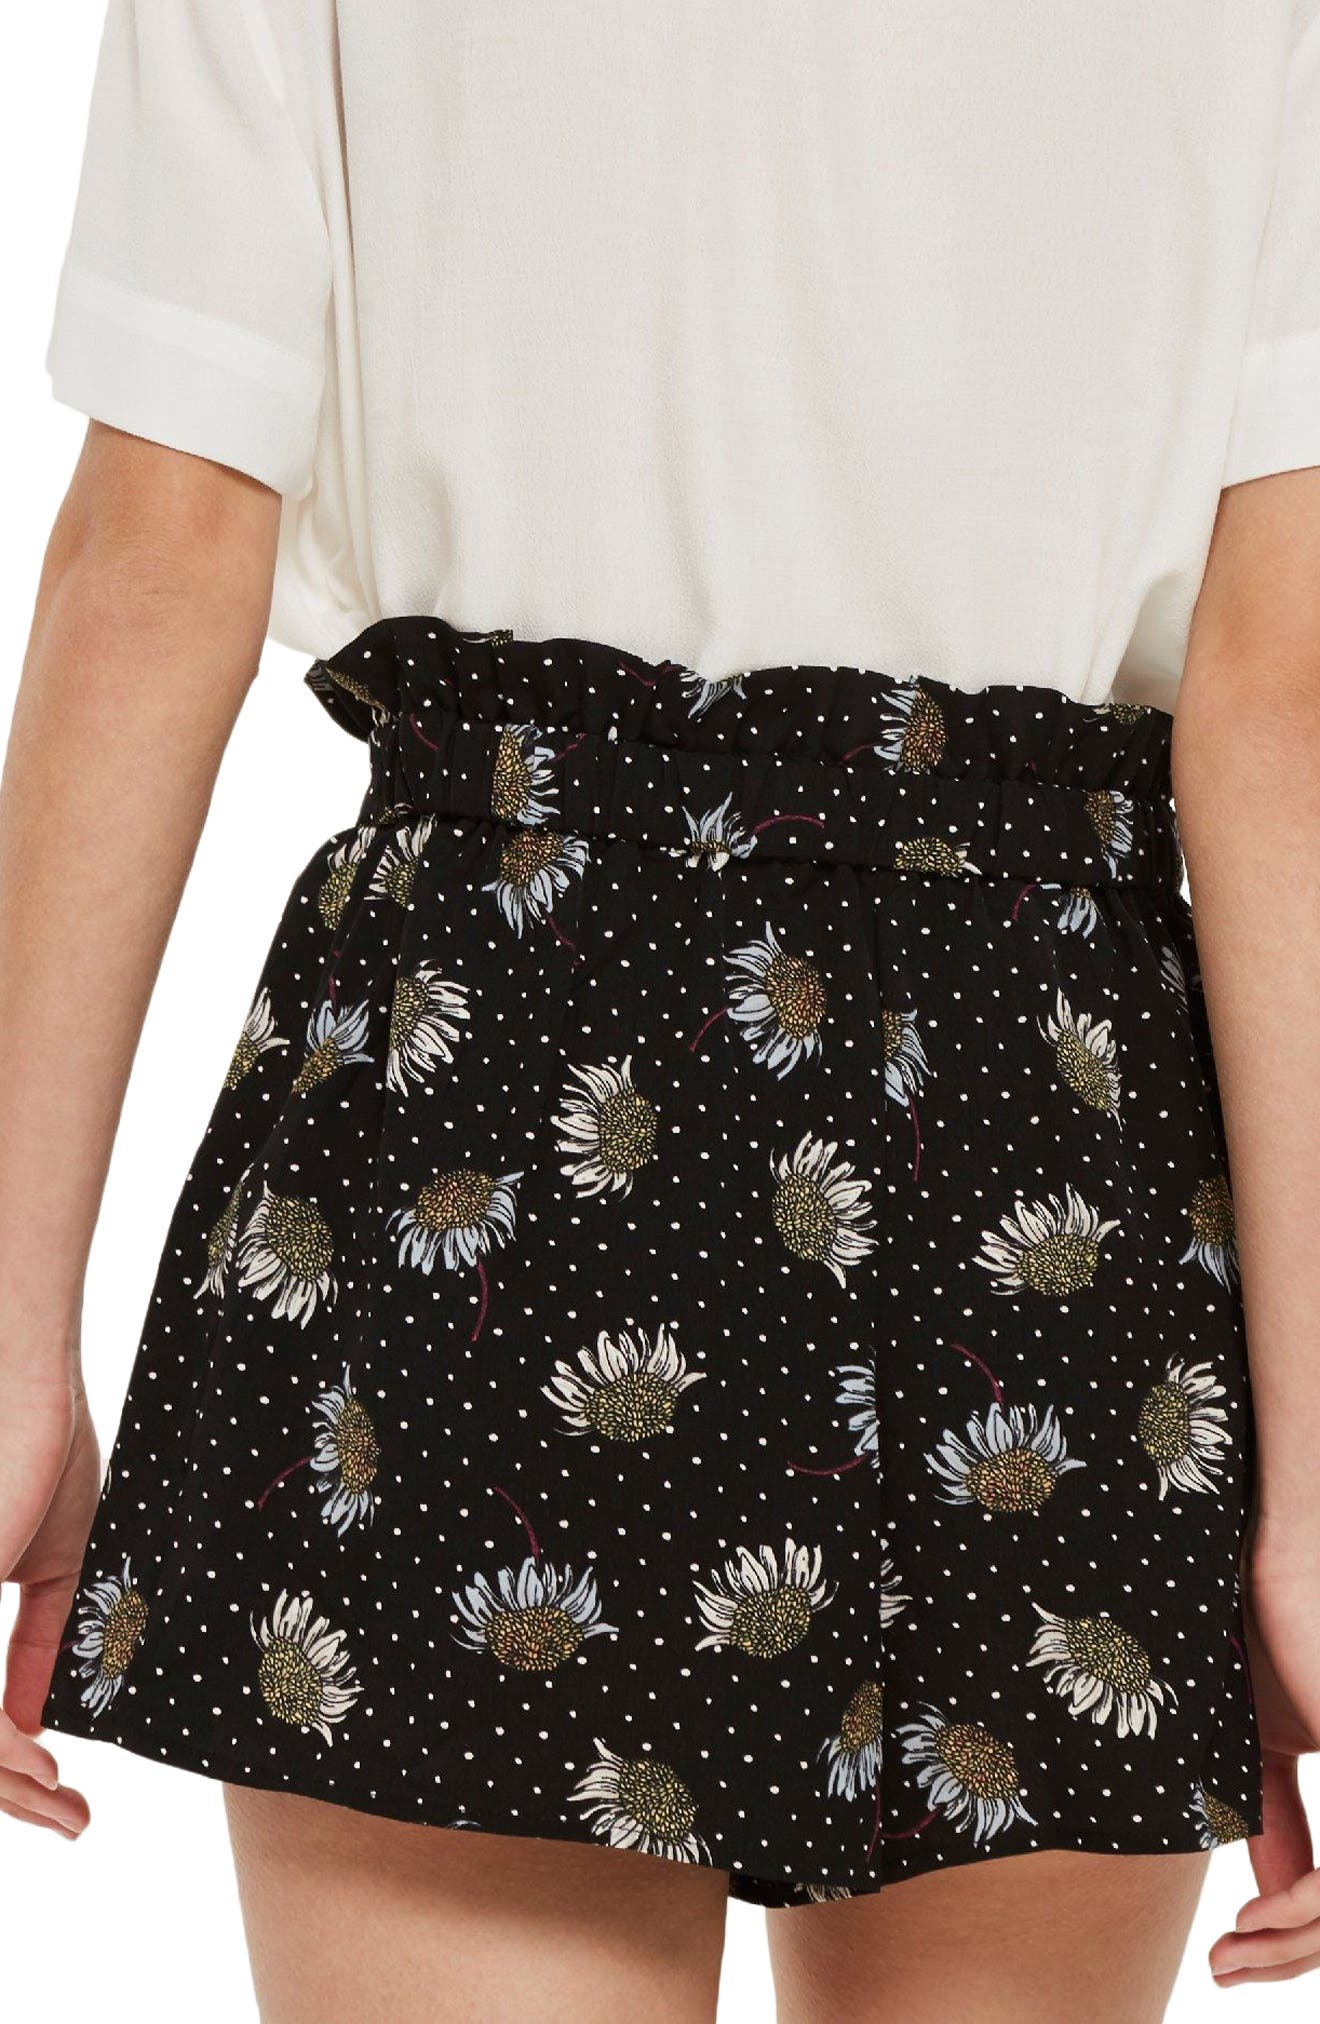 Daisy Print Frill Waist Shorts,                             Alternate thumbnail 2, color,                             001